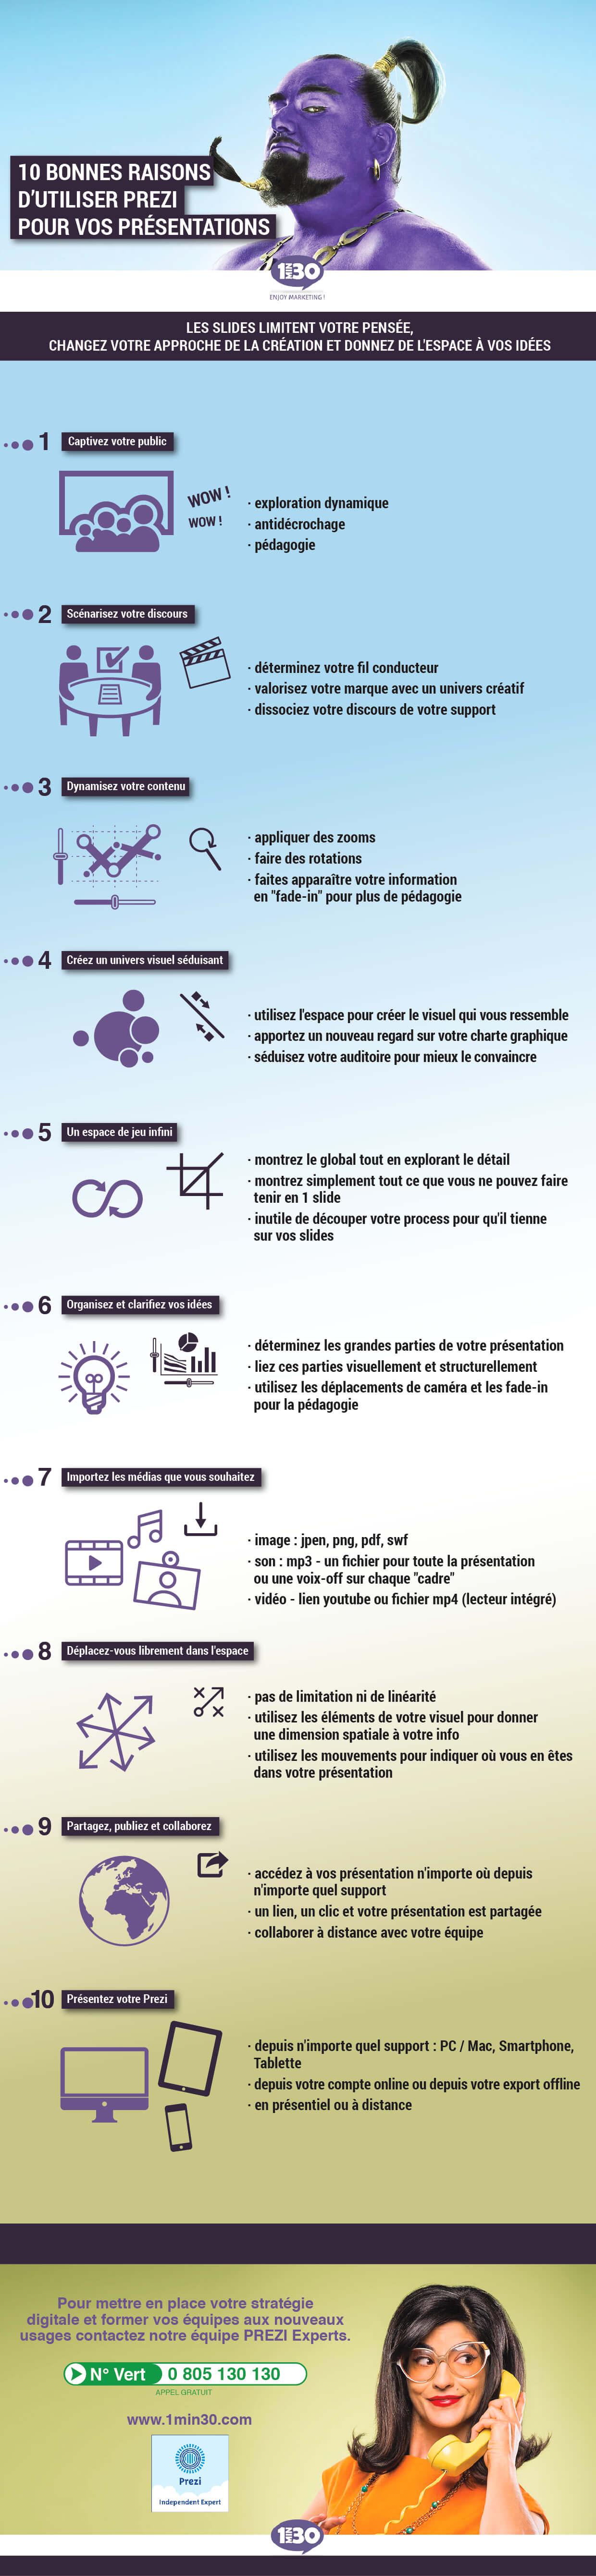 infographie_1min30_10-bonnes-raisons-prezi